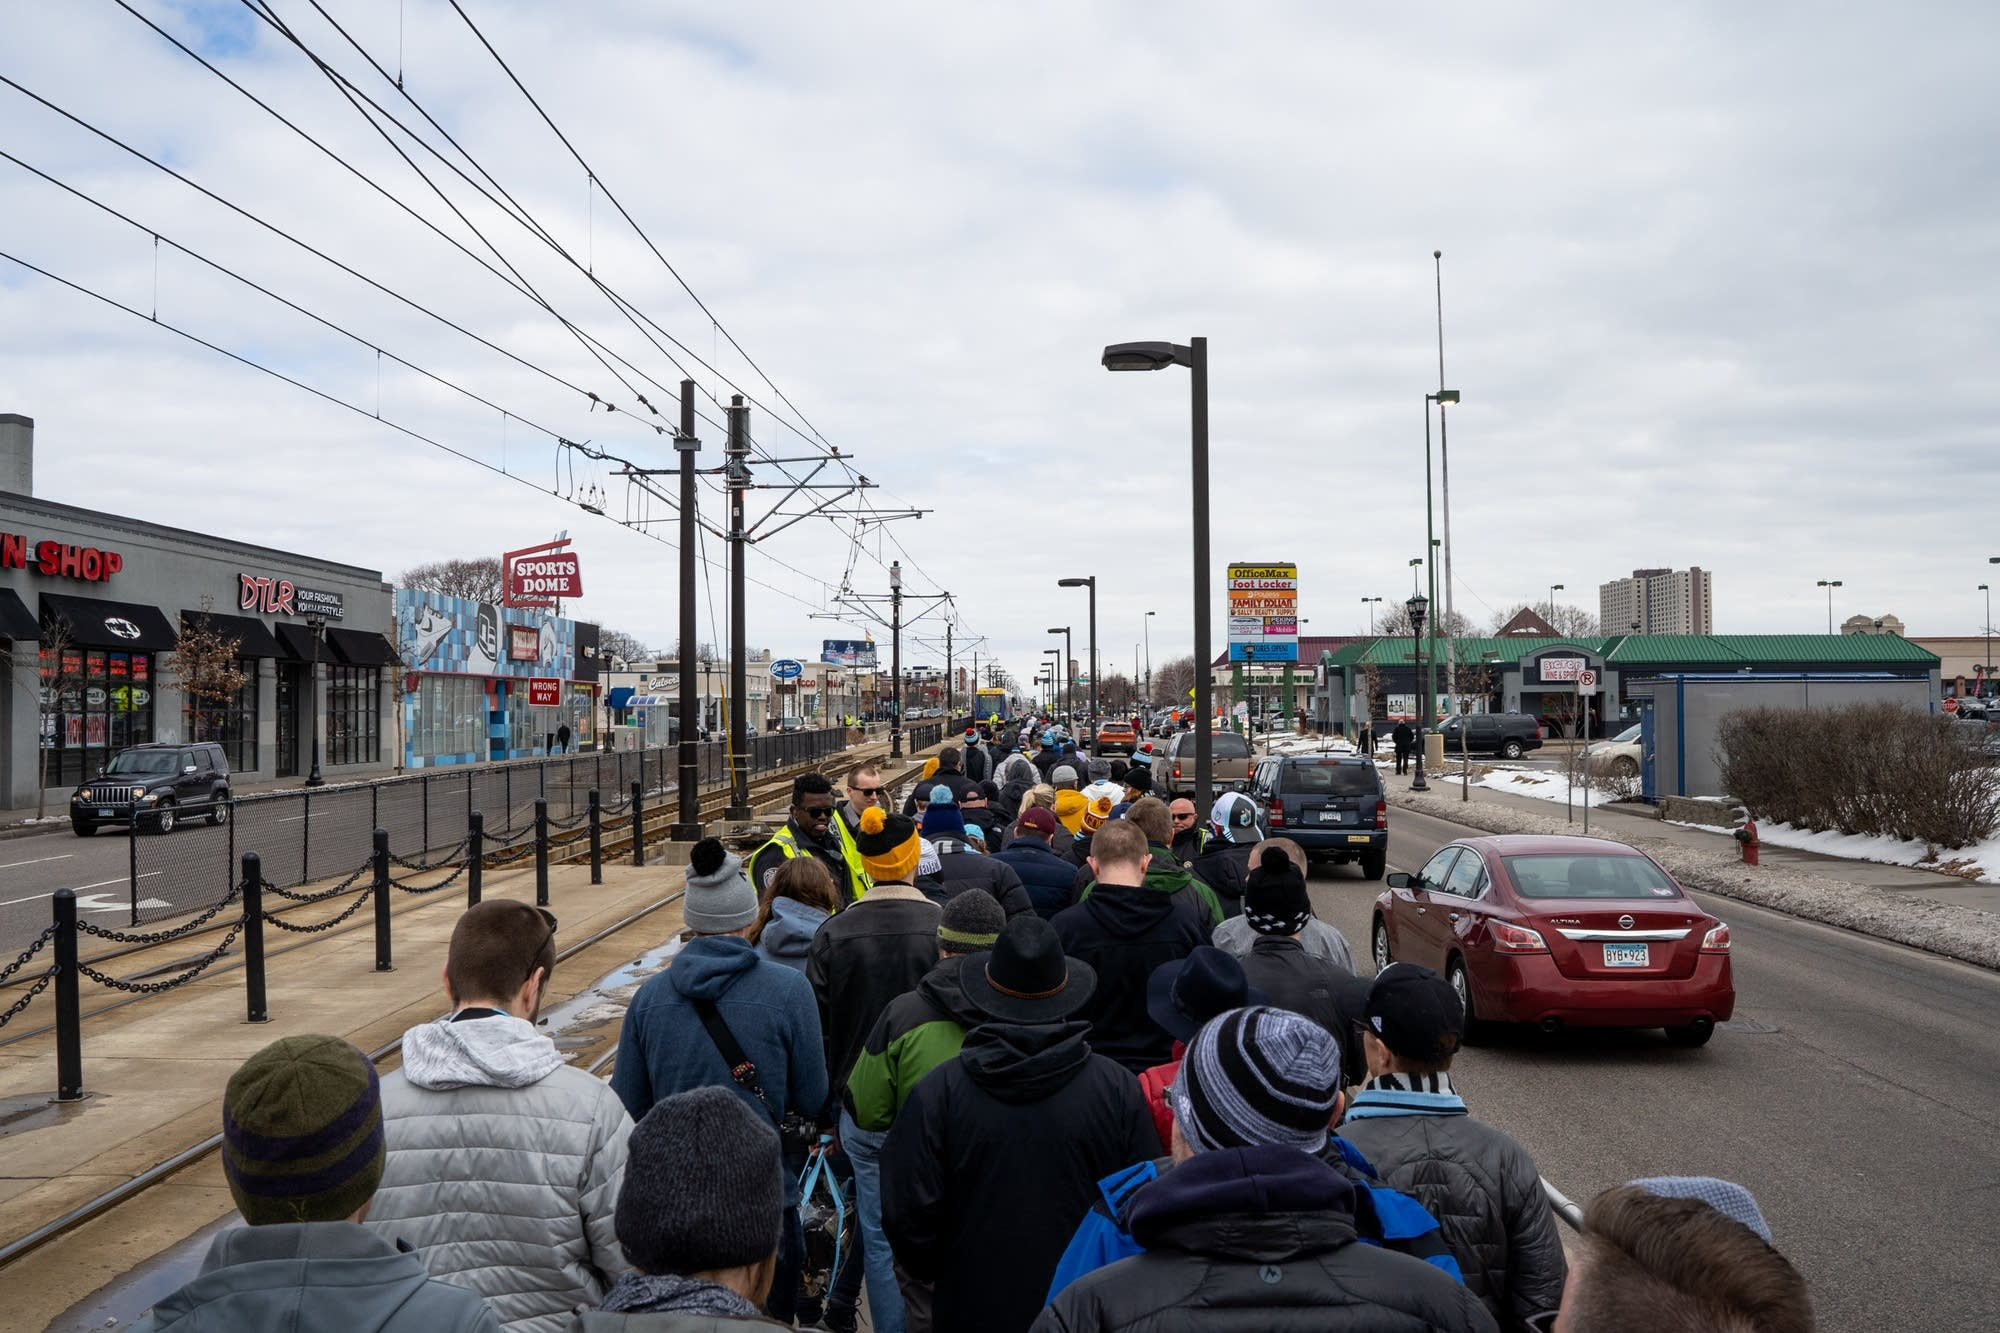 Minnesota United fans crowd the Snelling Ave. light rail platform.